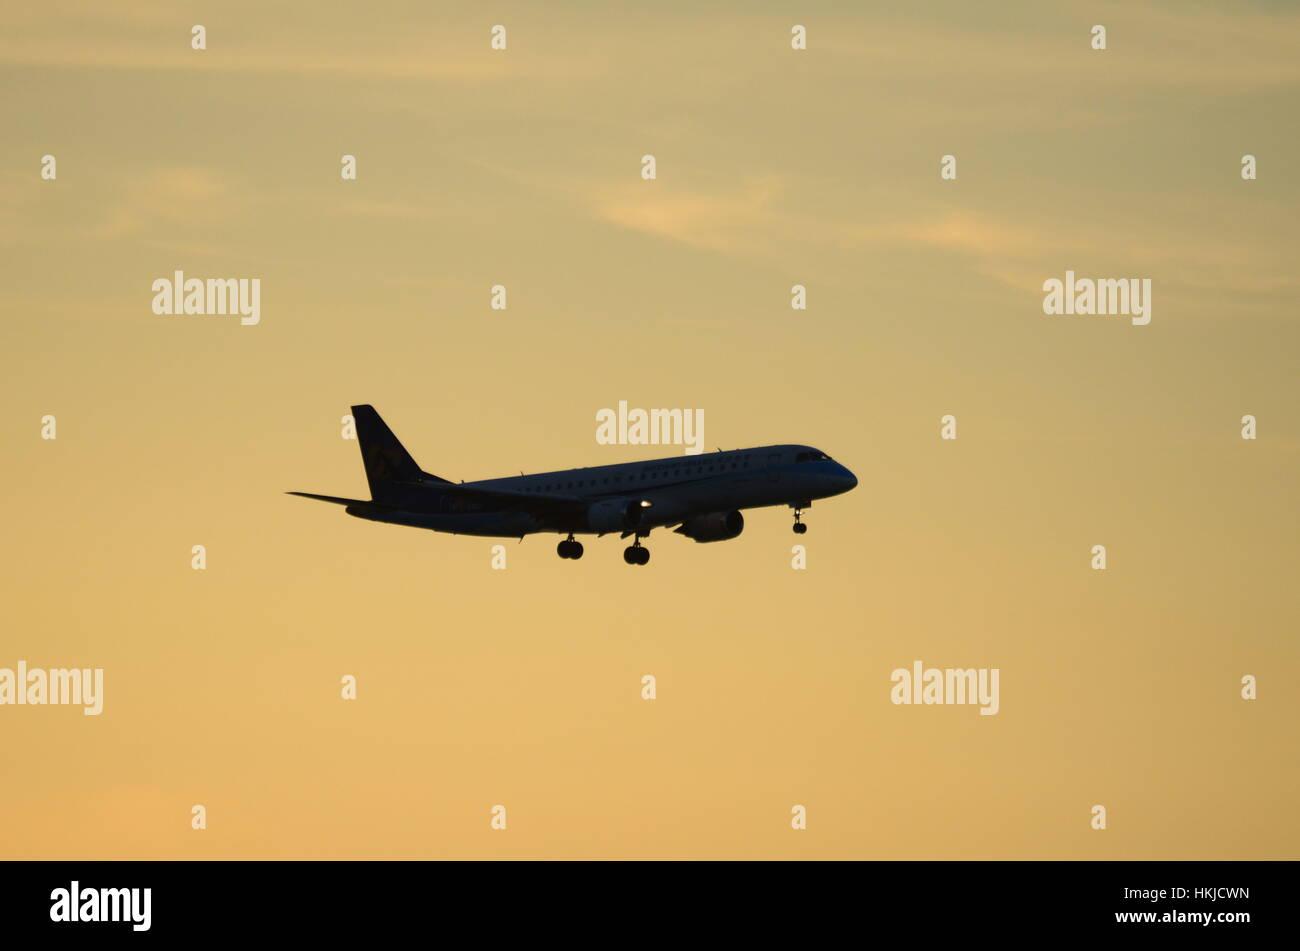 Mandarin Airlines Embraer E190 B-16822 landing at Hong Kong International Airport - Stock Image